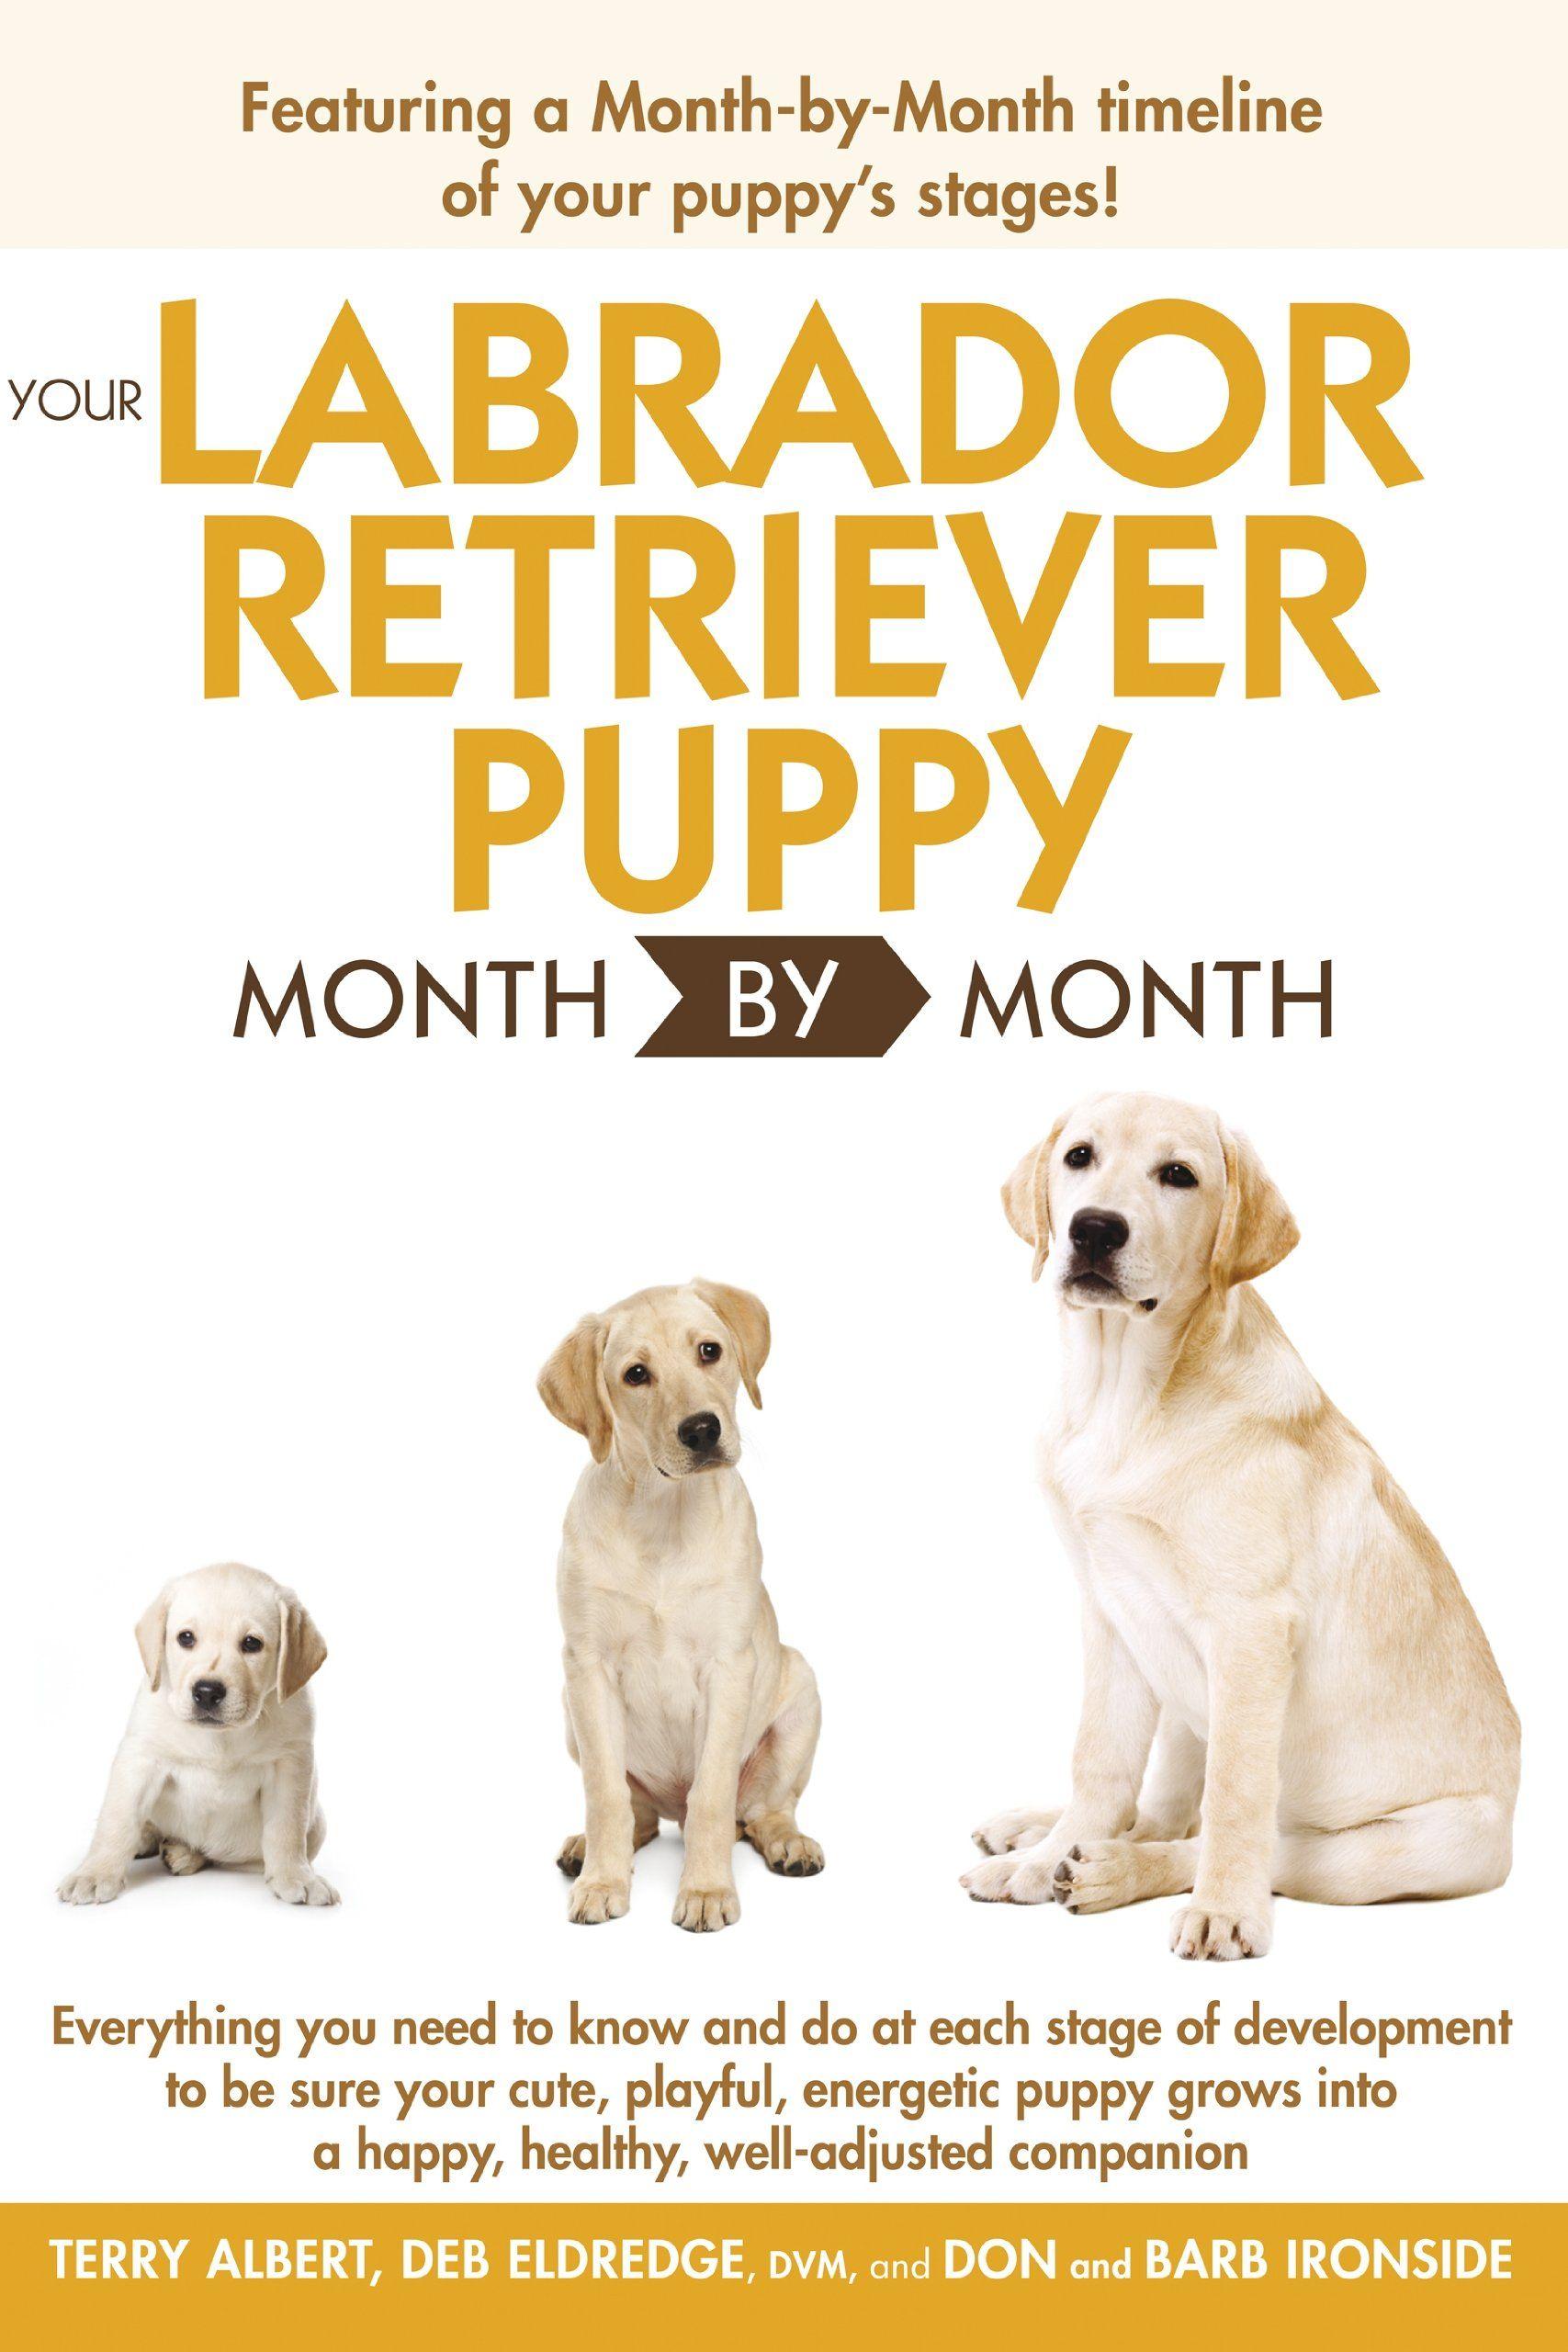 Your Labrador Retriever Puppy Month By Month Debra Eldredge Terry Albert Amazon Com Labrador Retriever Labrador Retriever Puppies Labrador Puppy